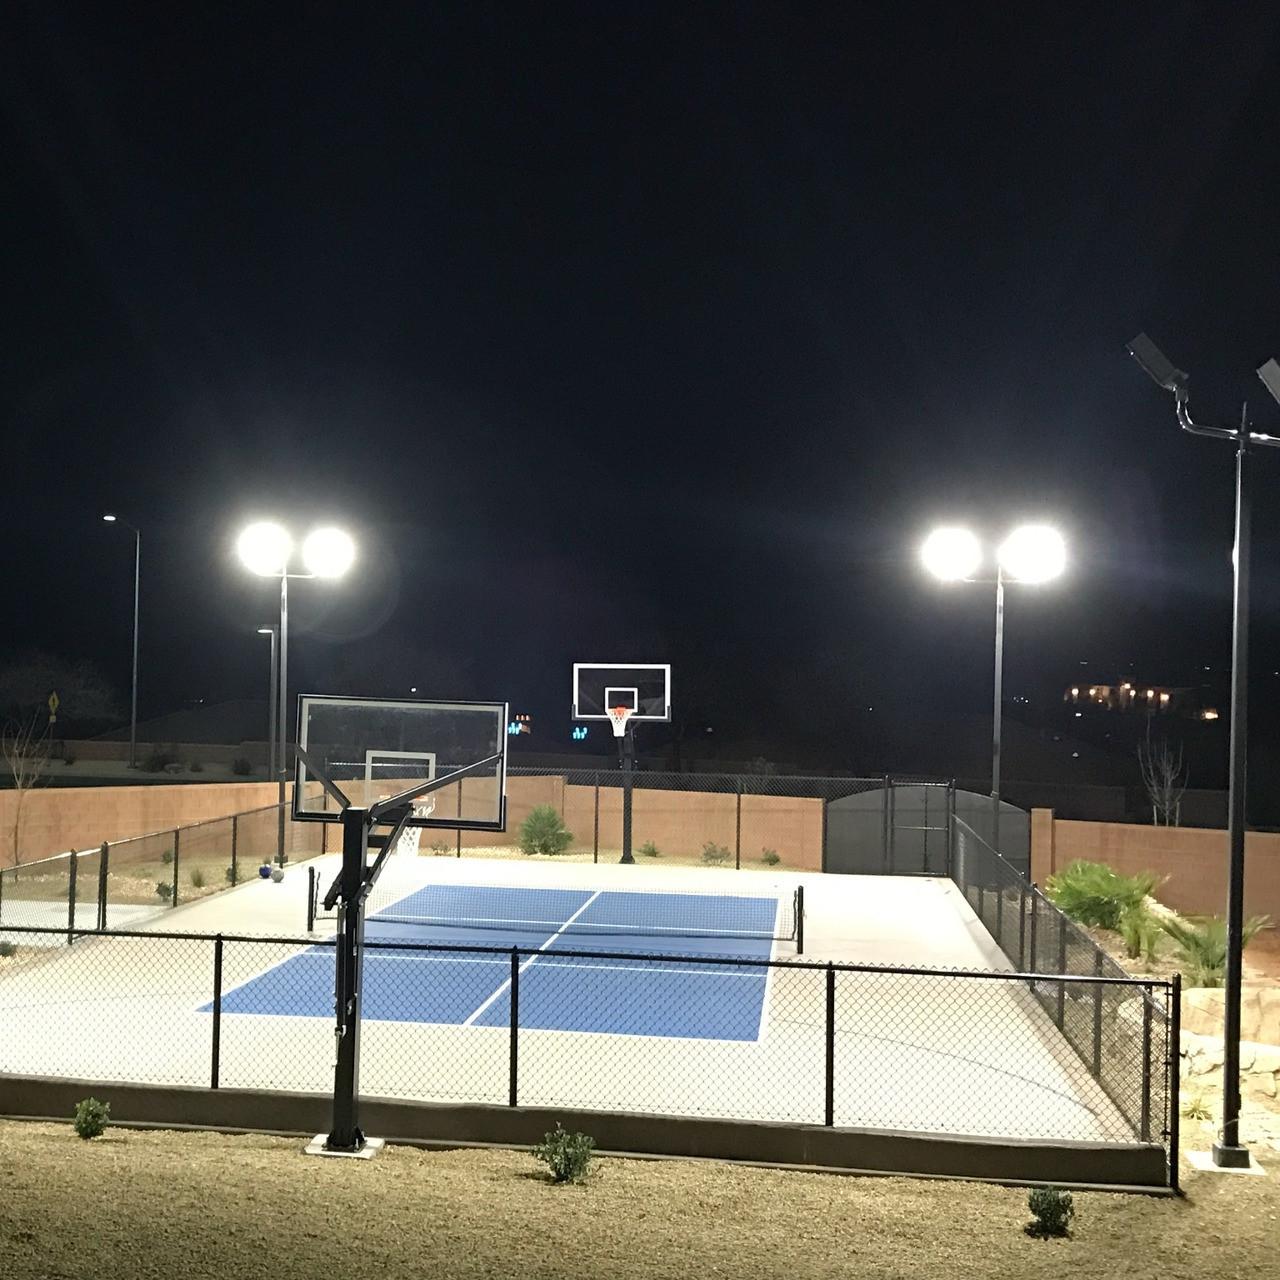 Backyard Rink Lighting: #0690: Incredible Backyard Sports Court